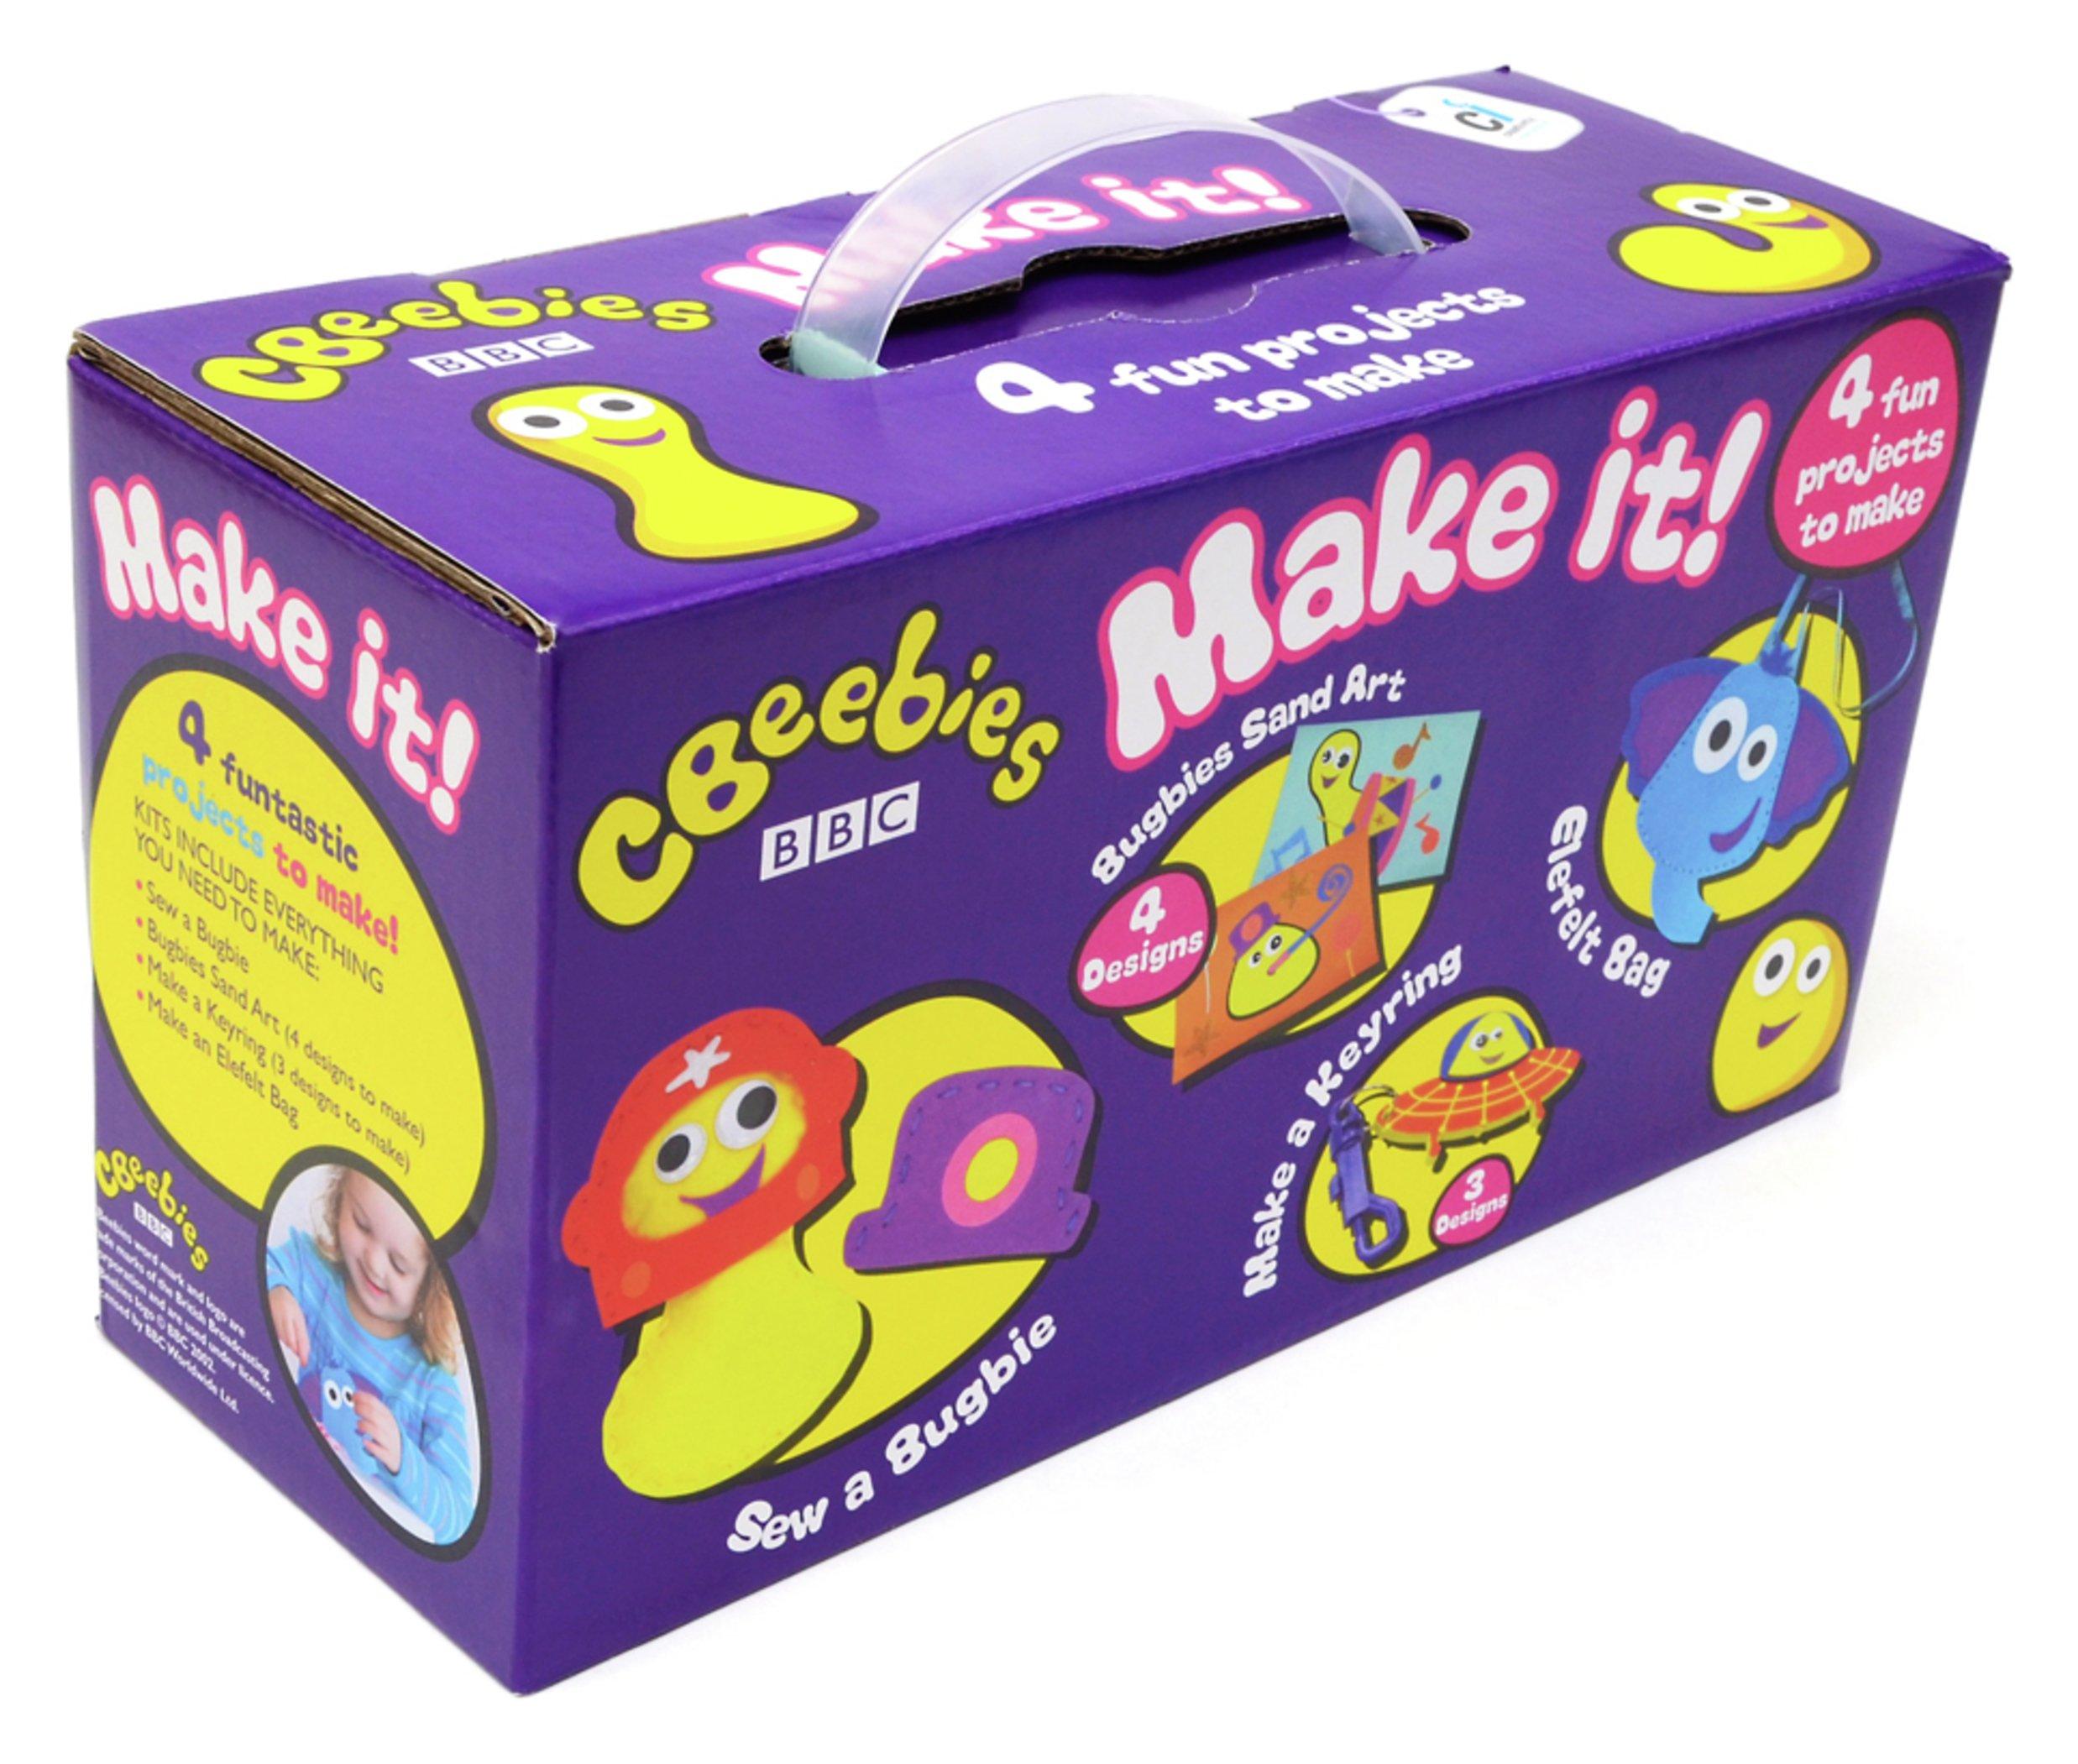 Image of Cbeebies Craft Kit Multipack.